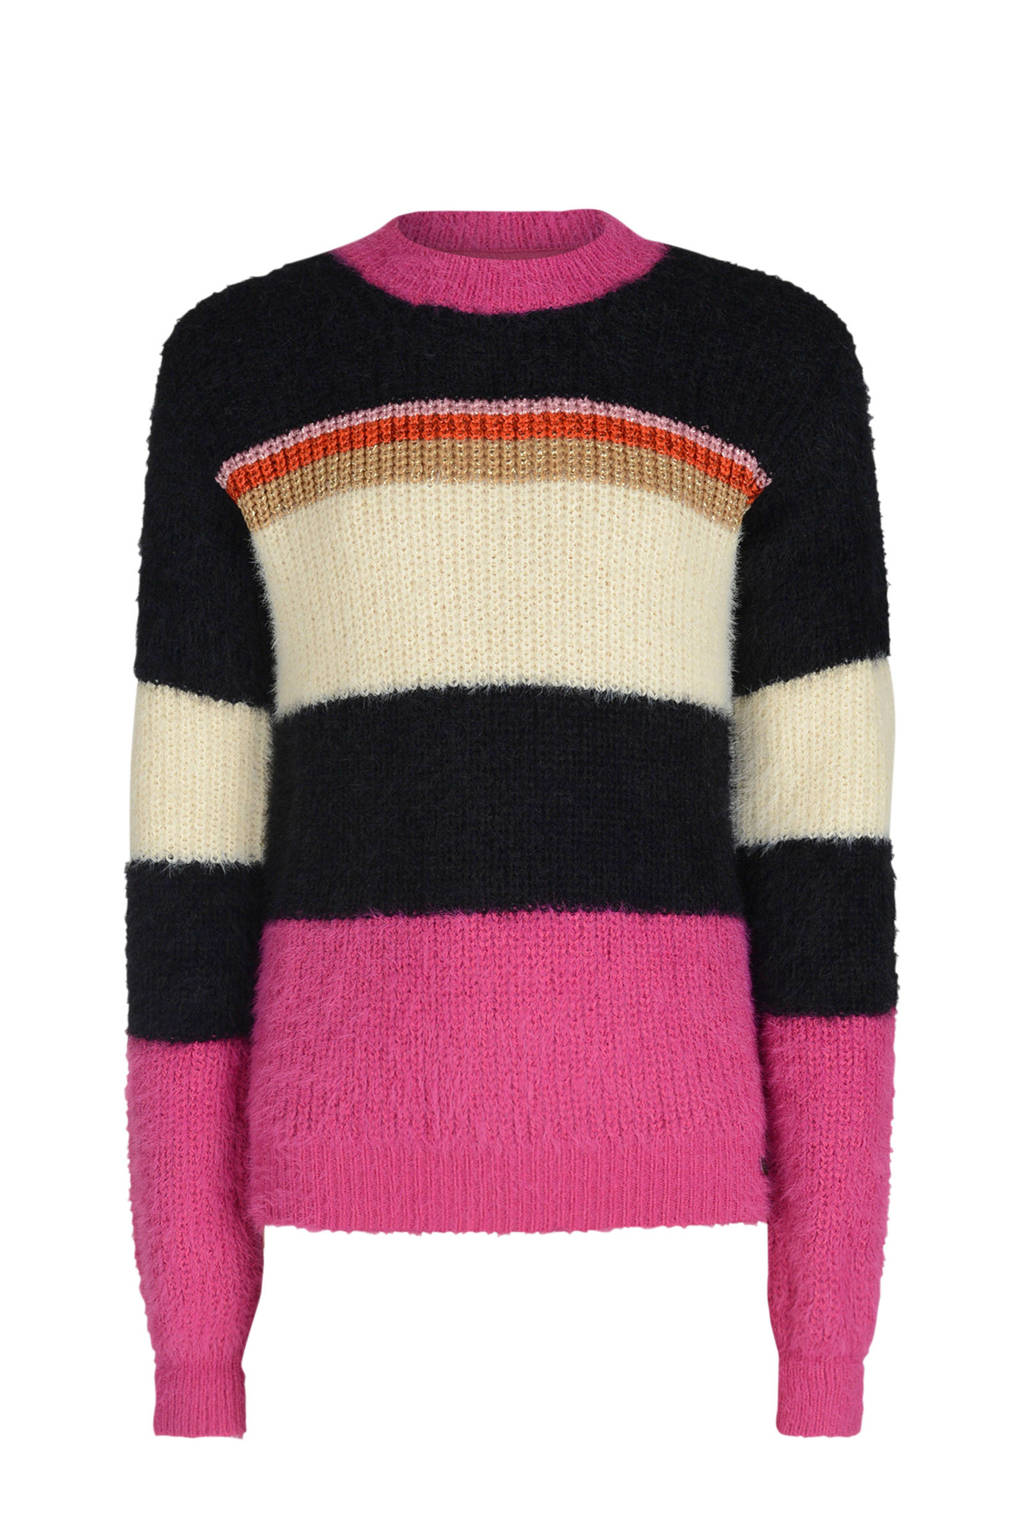 Jill & Mitch by Shoeby gestreepte gebreide trui Asmae zwart/roze/ecru, Zwart/roze/ecru